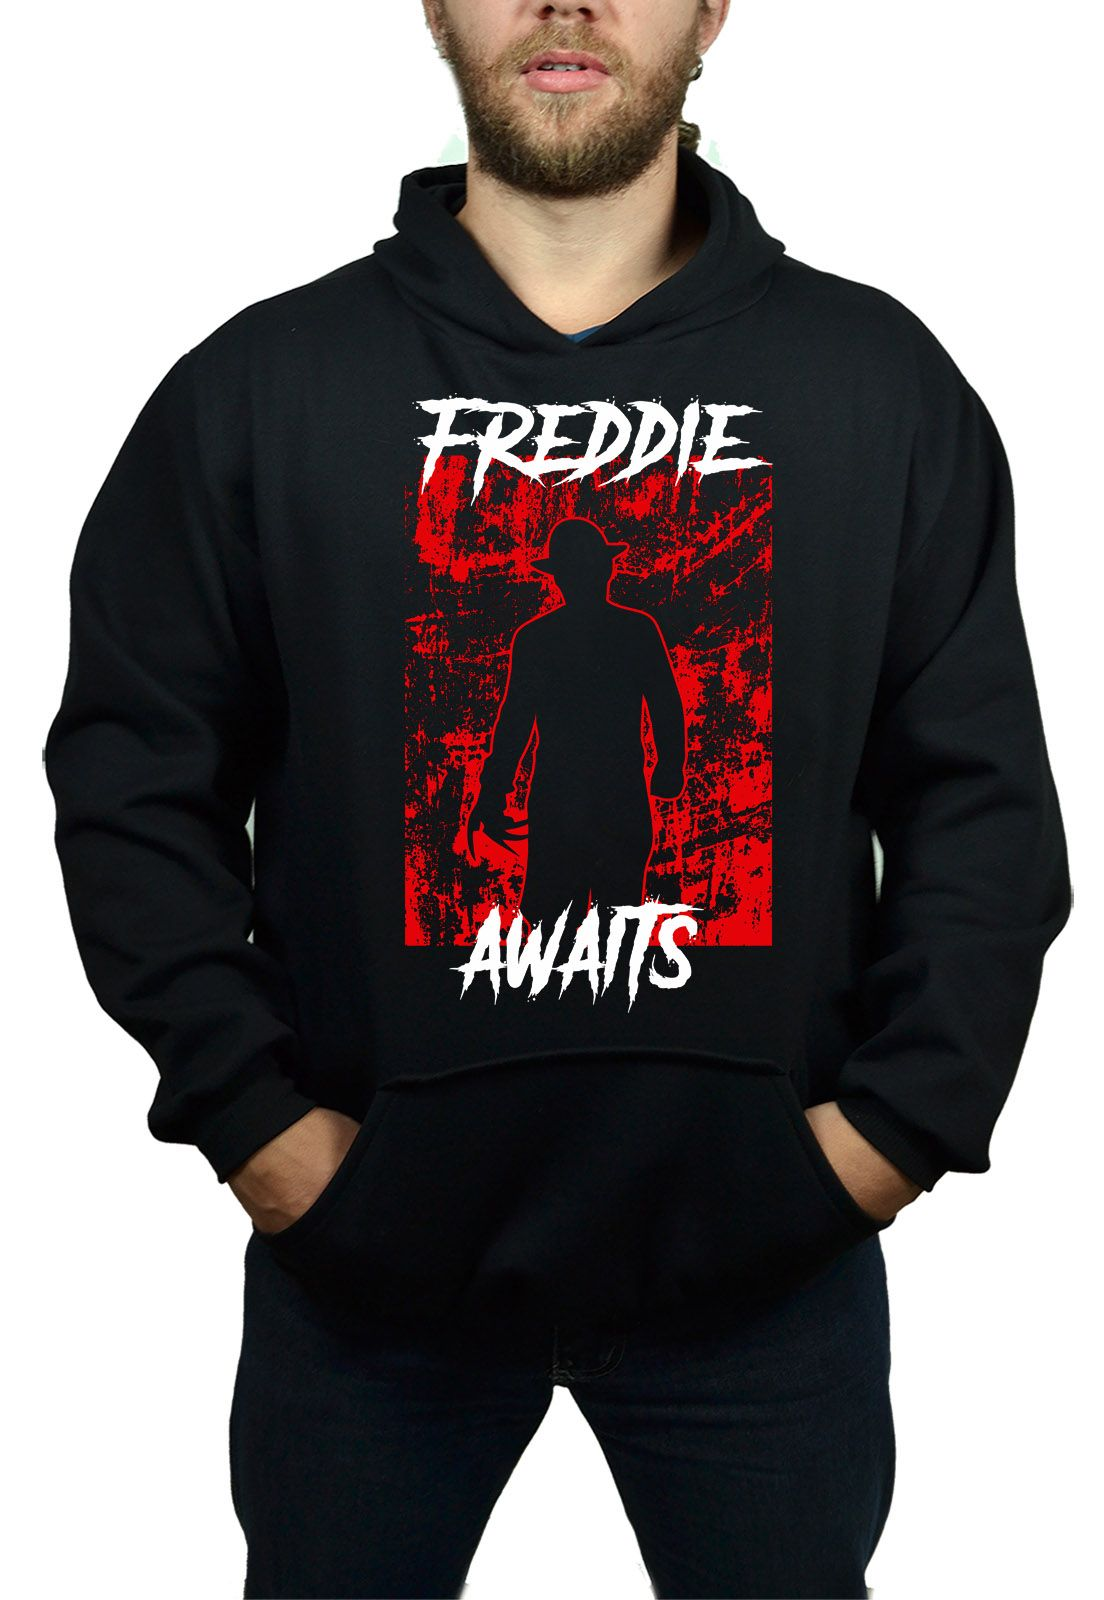 Moletom Freddie Krueger Awaits Preto  - HShop